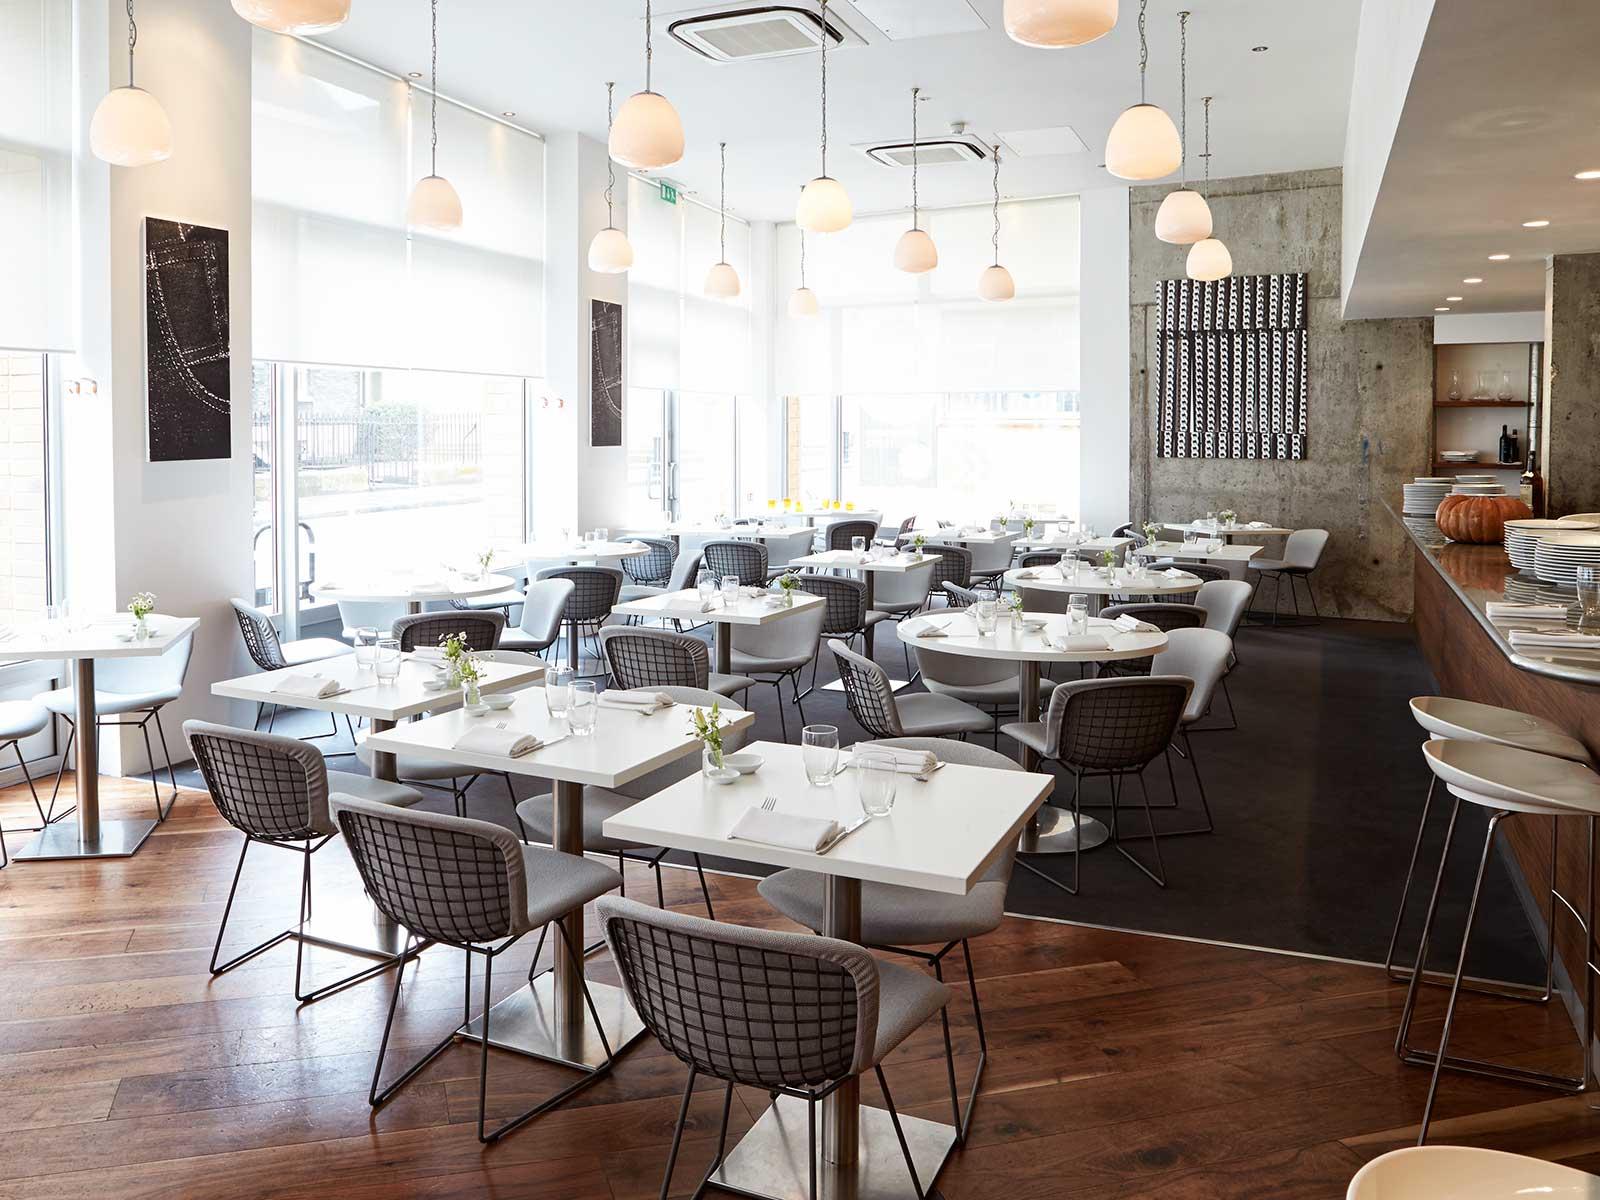 Fine Italian dining in Bermondsey